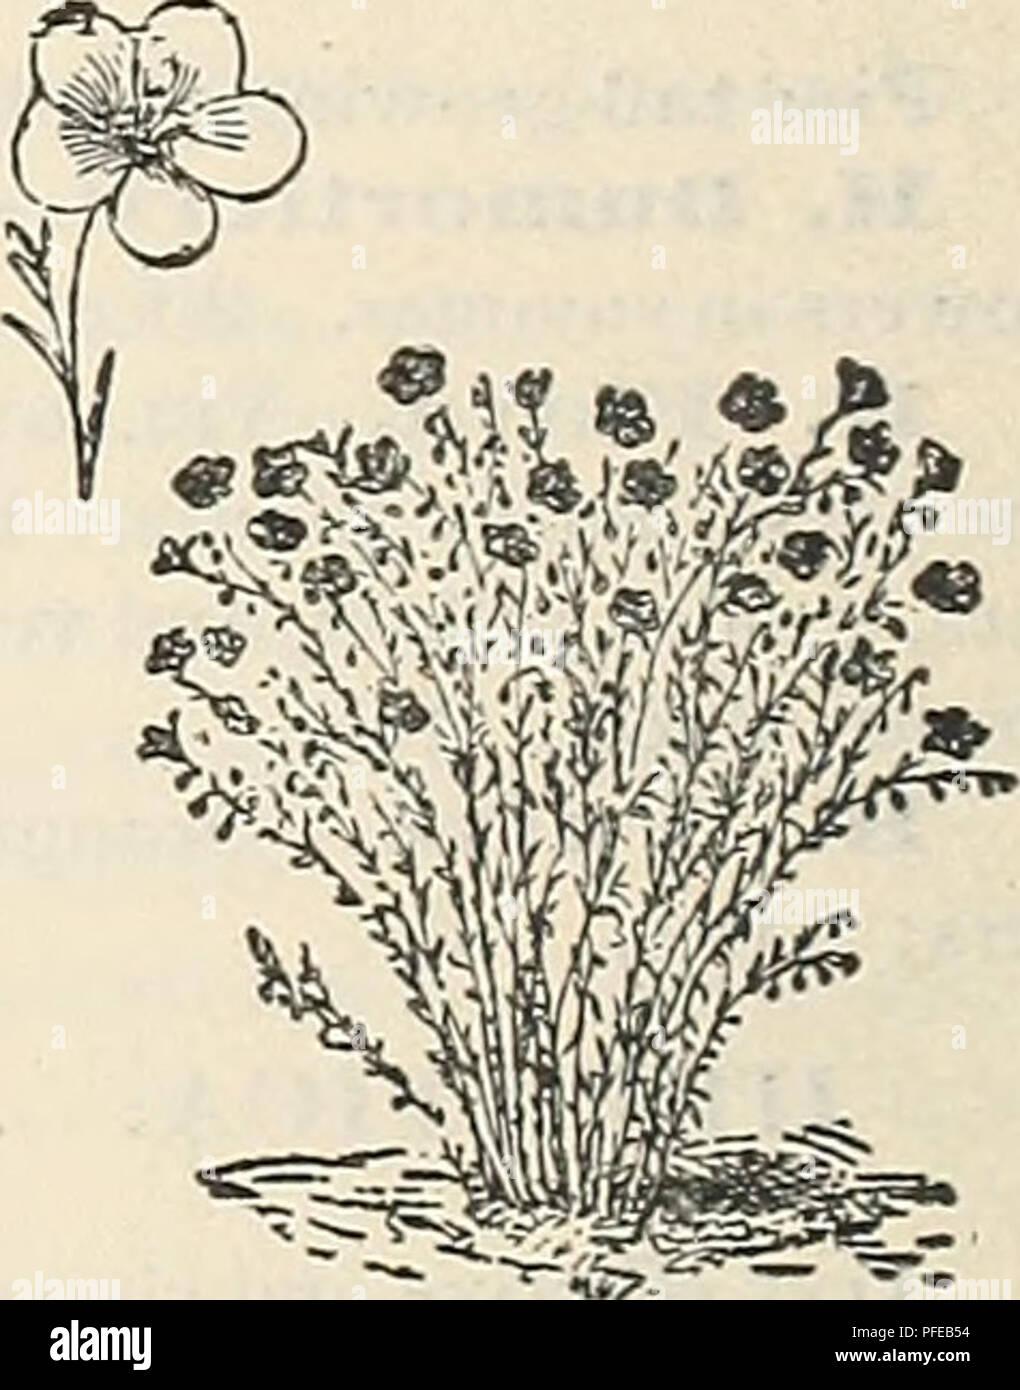 Descriptive Catalogue Of The Jewell Nursery Co Nursery Stock